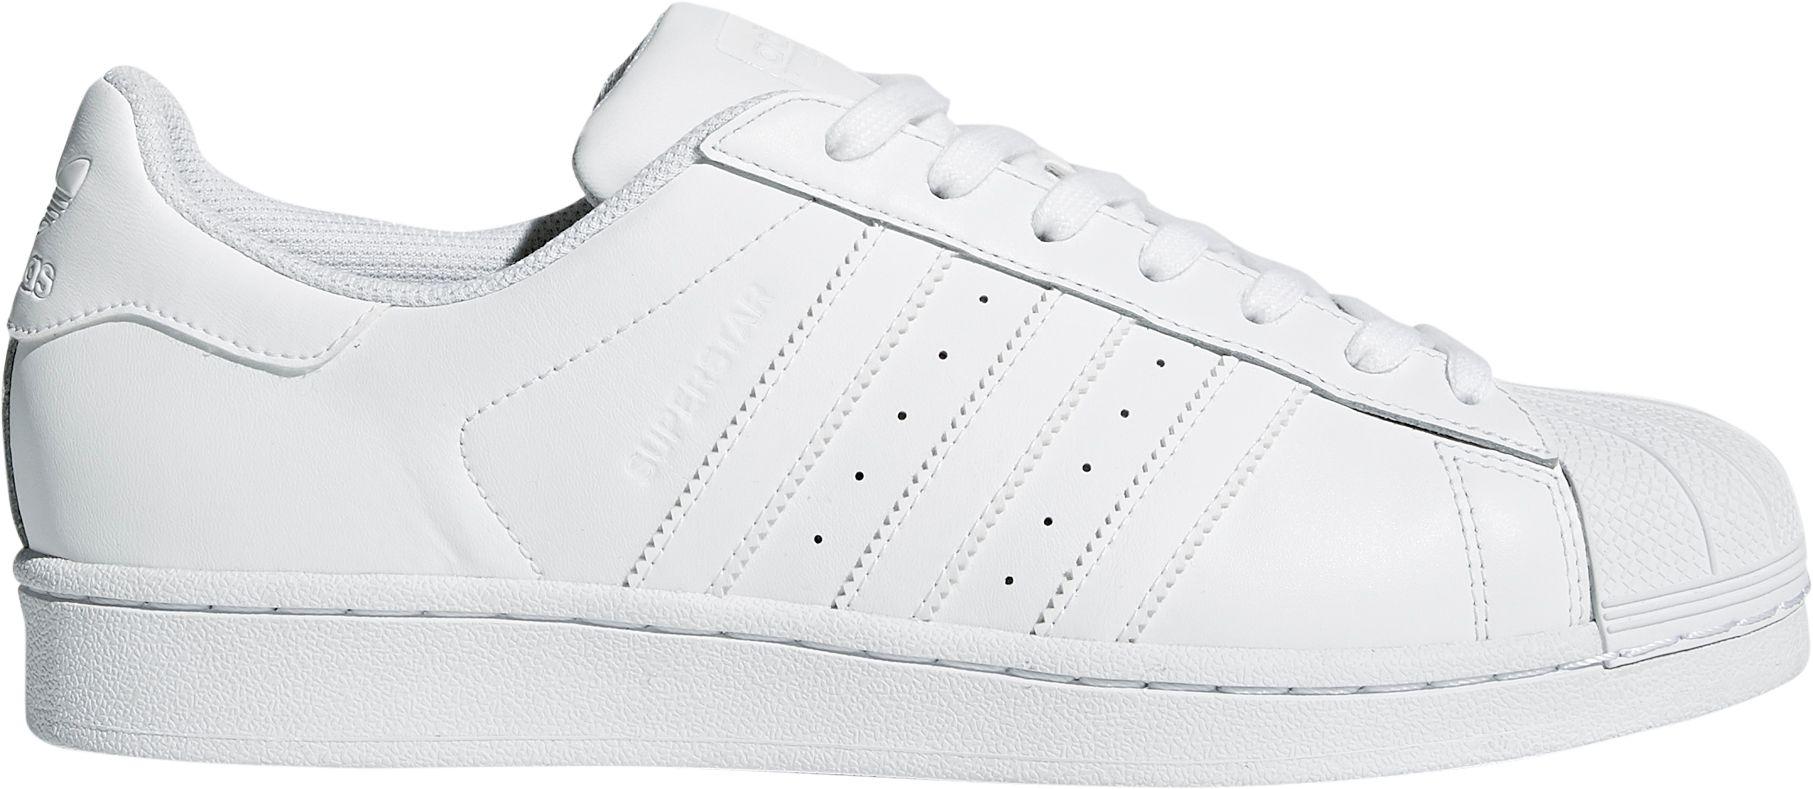 adidas Originals Men's Superstar Shoes |